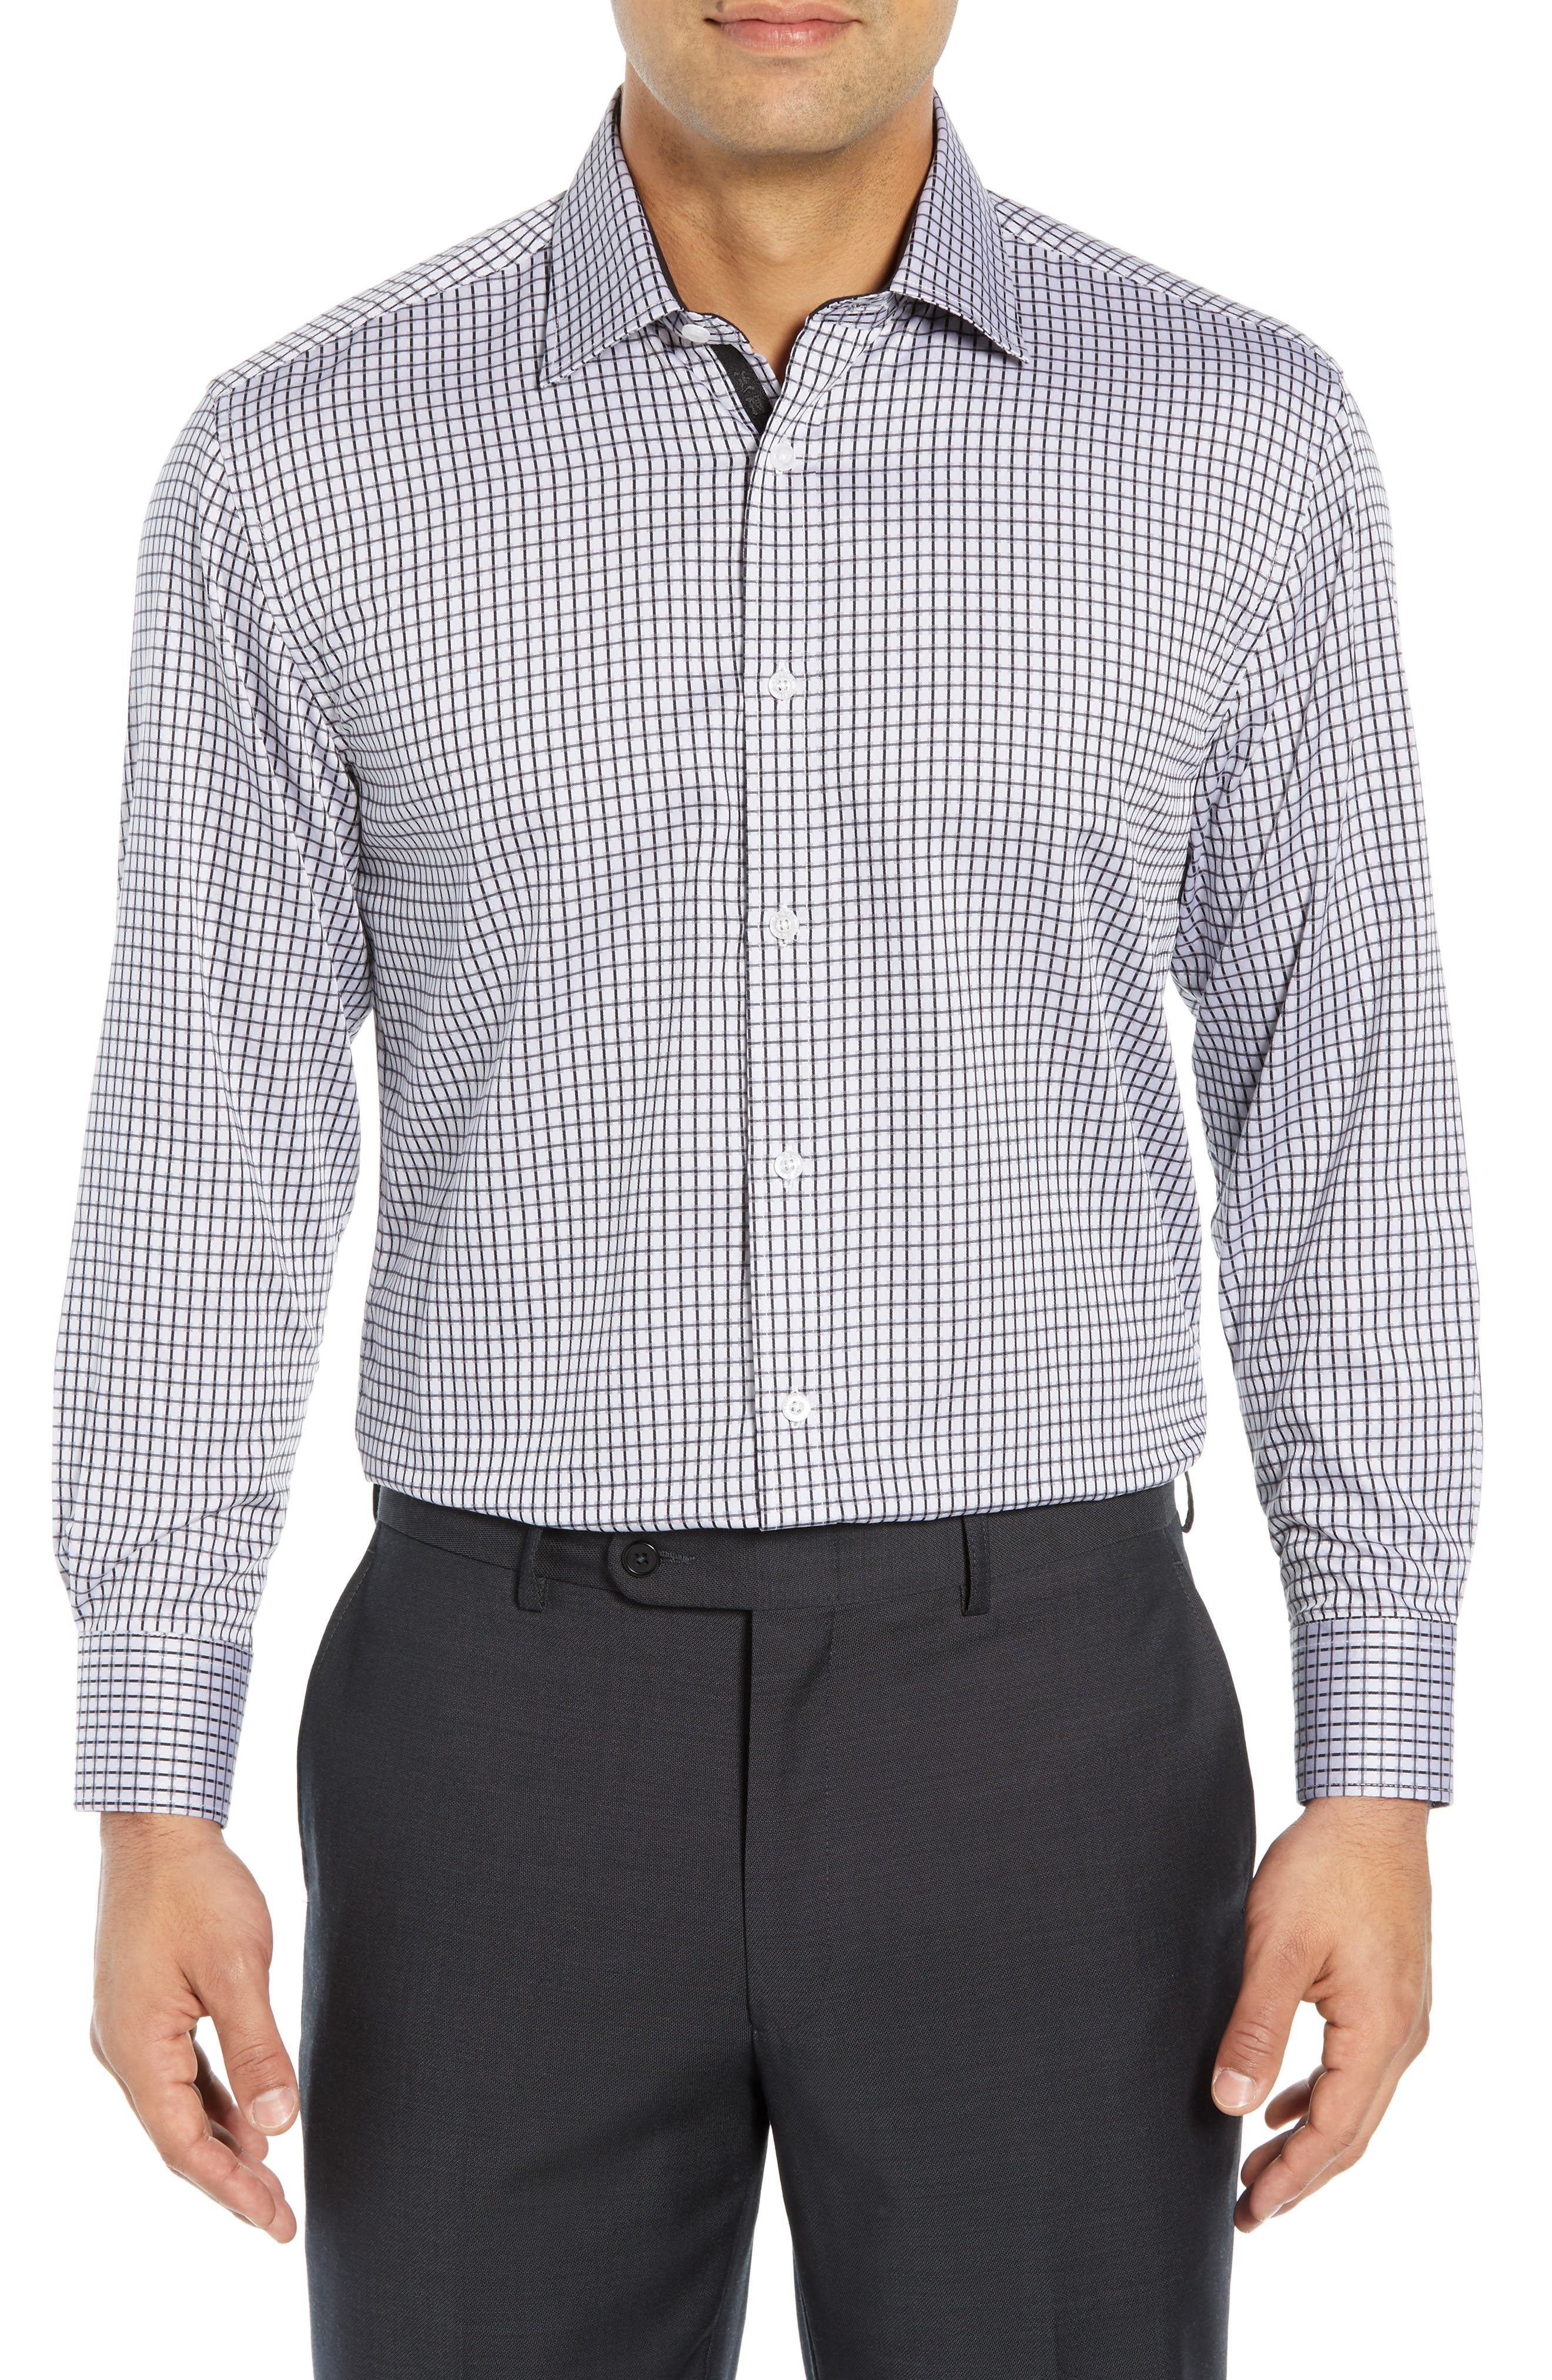 ENGLISH LAUNDRY Regular Fit Check Dress Shirt in Grey